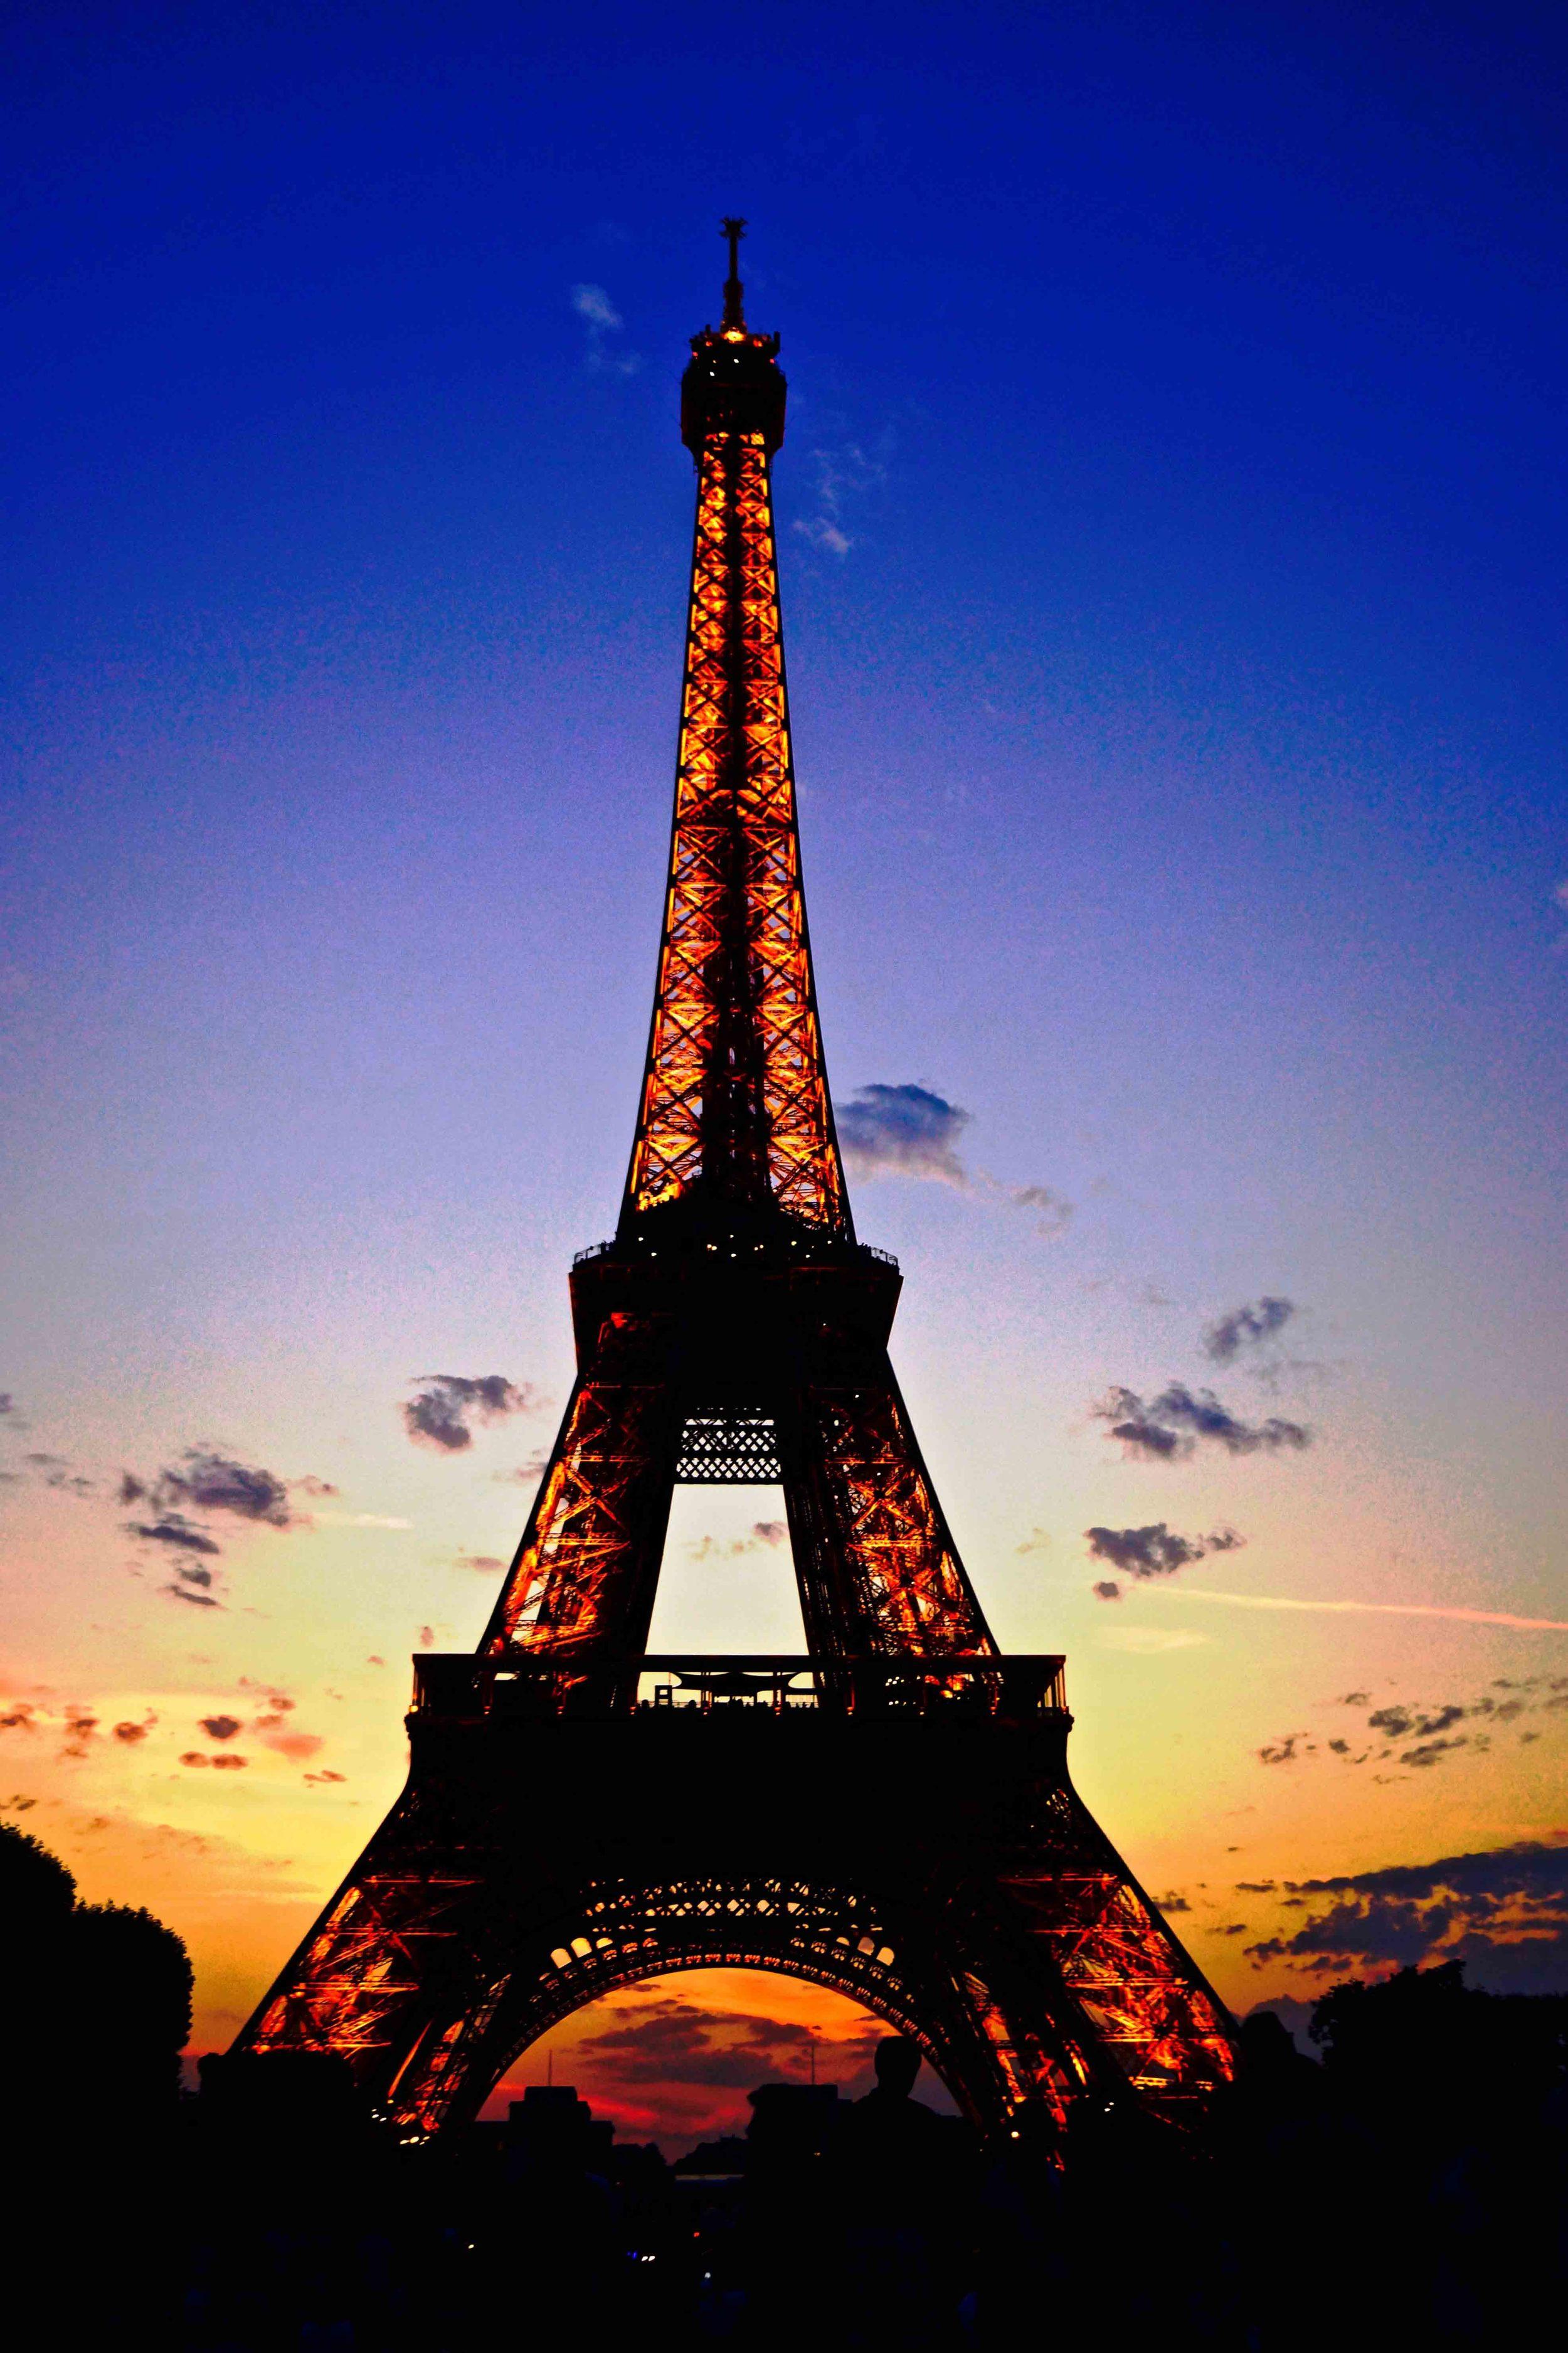 Eiffel Tower, Paris, July 2015